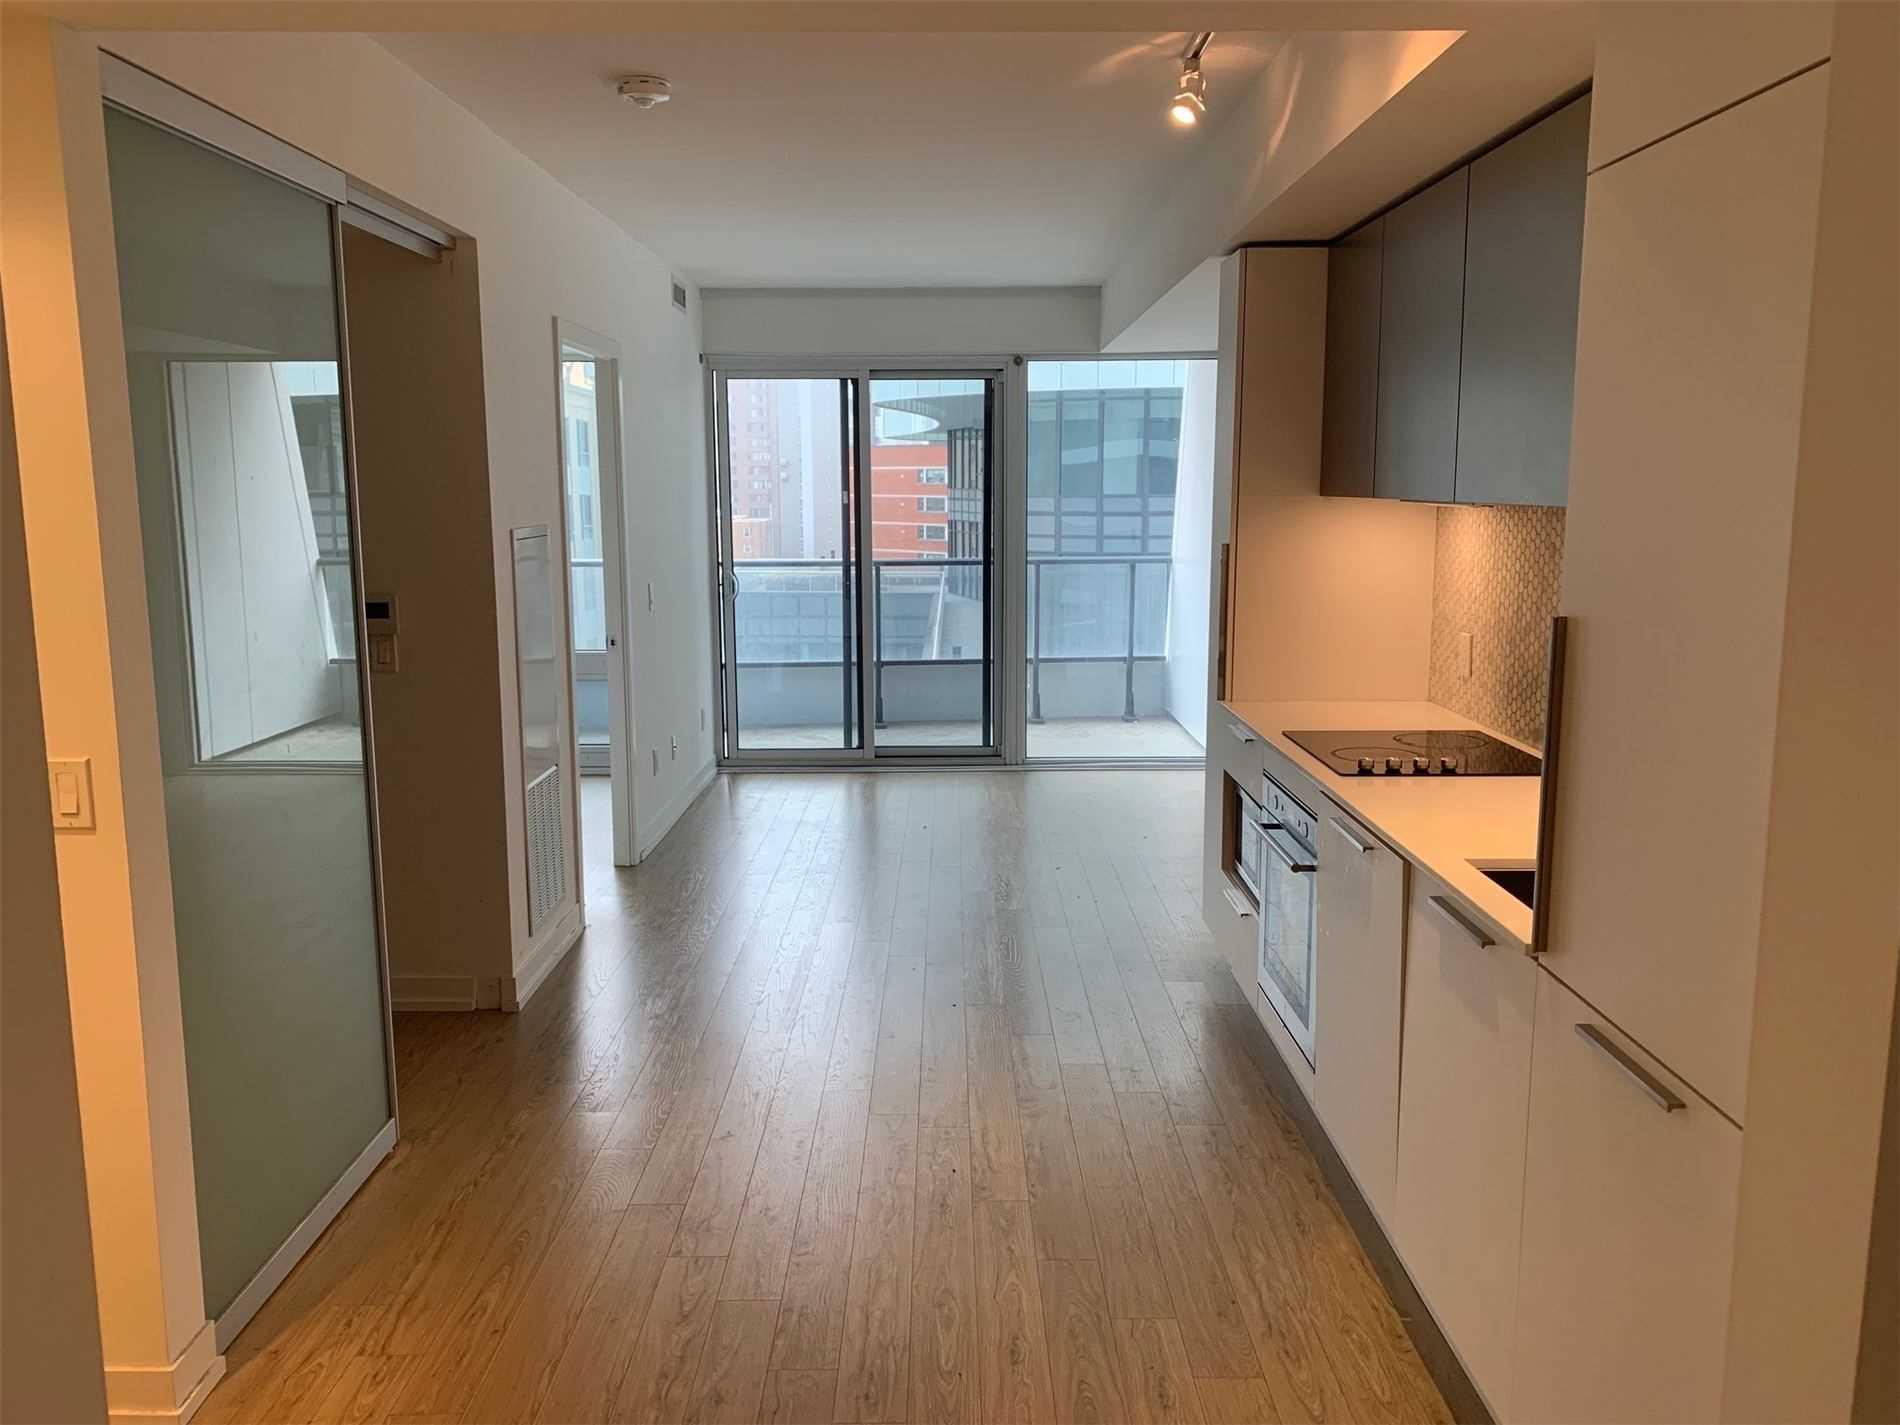 1001 - 85 Wood St - Church-Yonge Corridor Condo Apt for sale, 1 Bedroom (C5221011) - #5